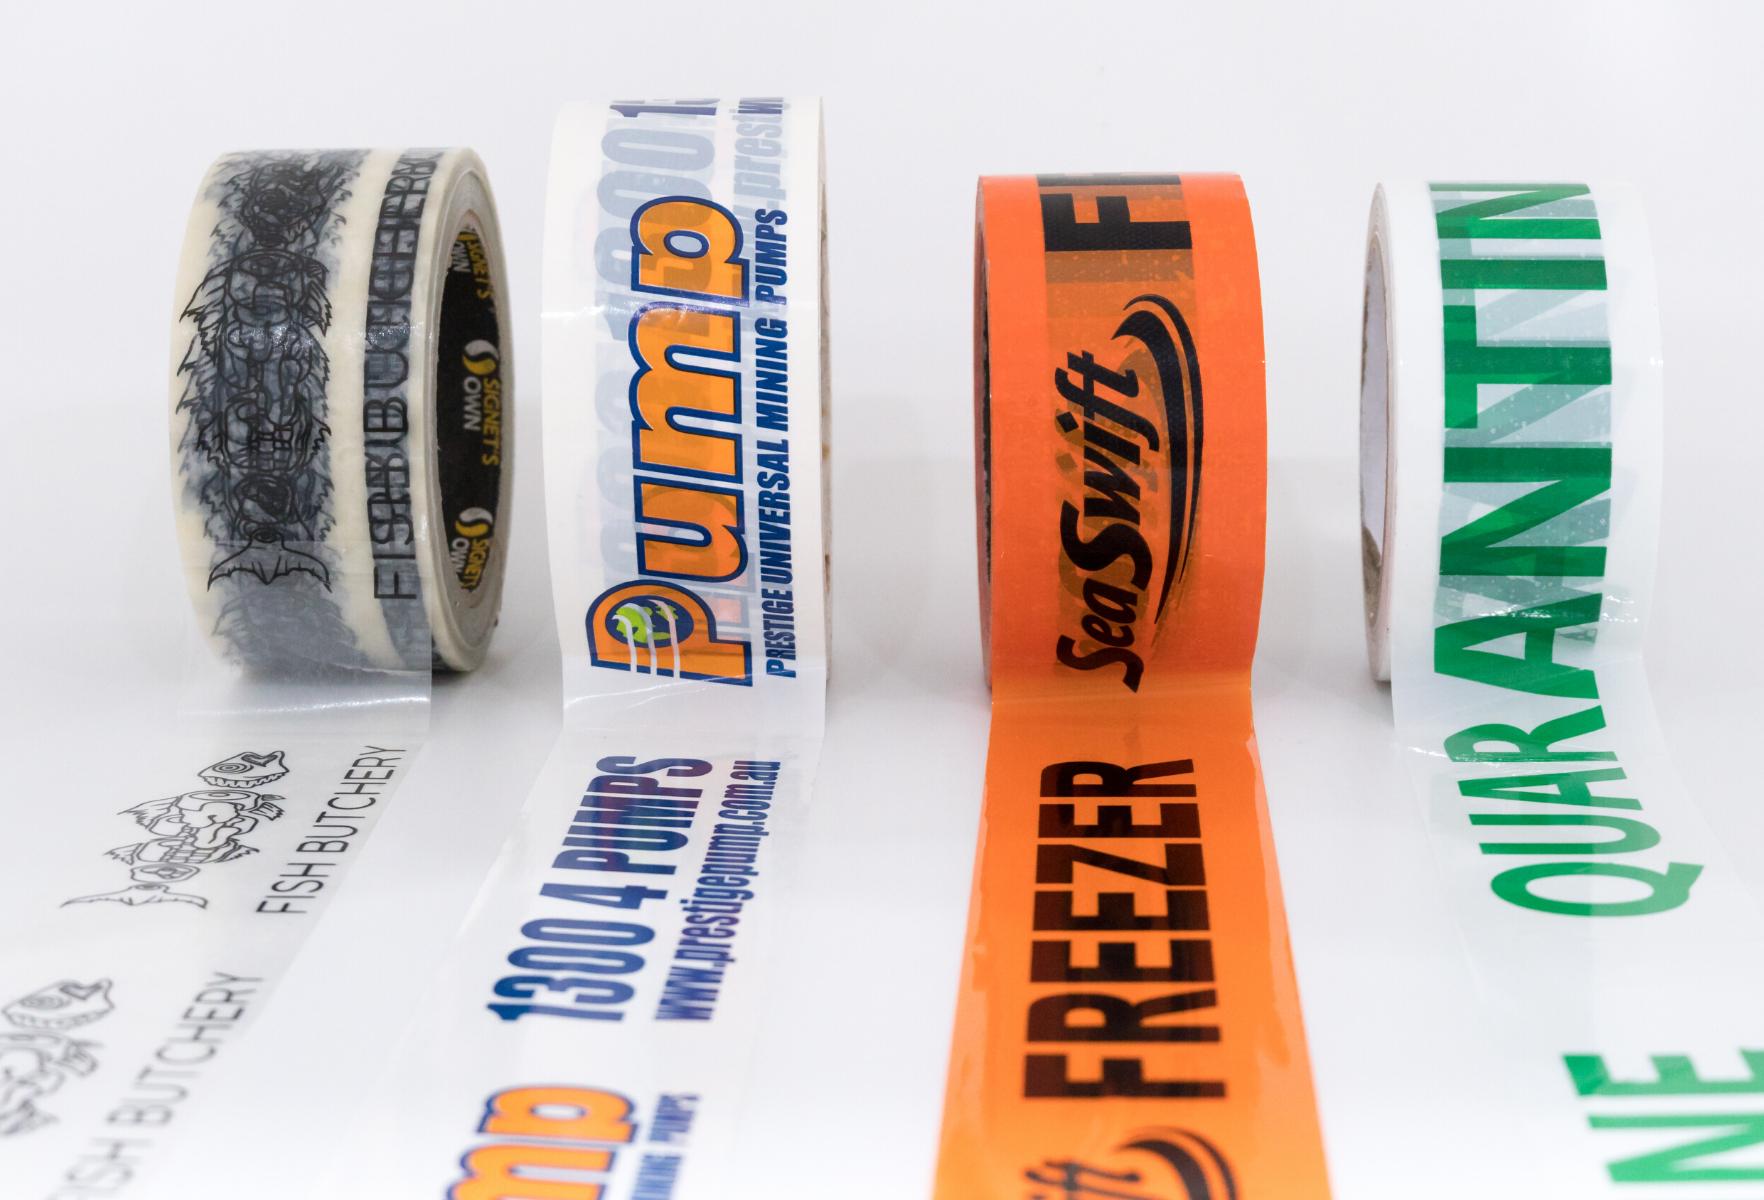 Signet's Custom Tape Lined Up